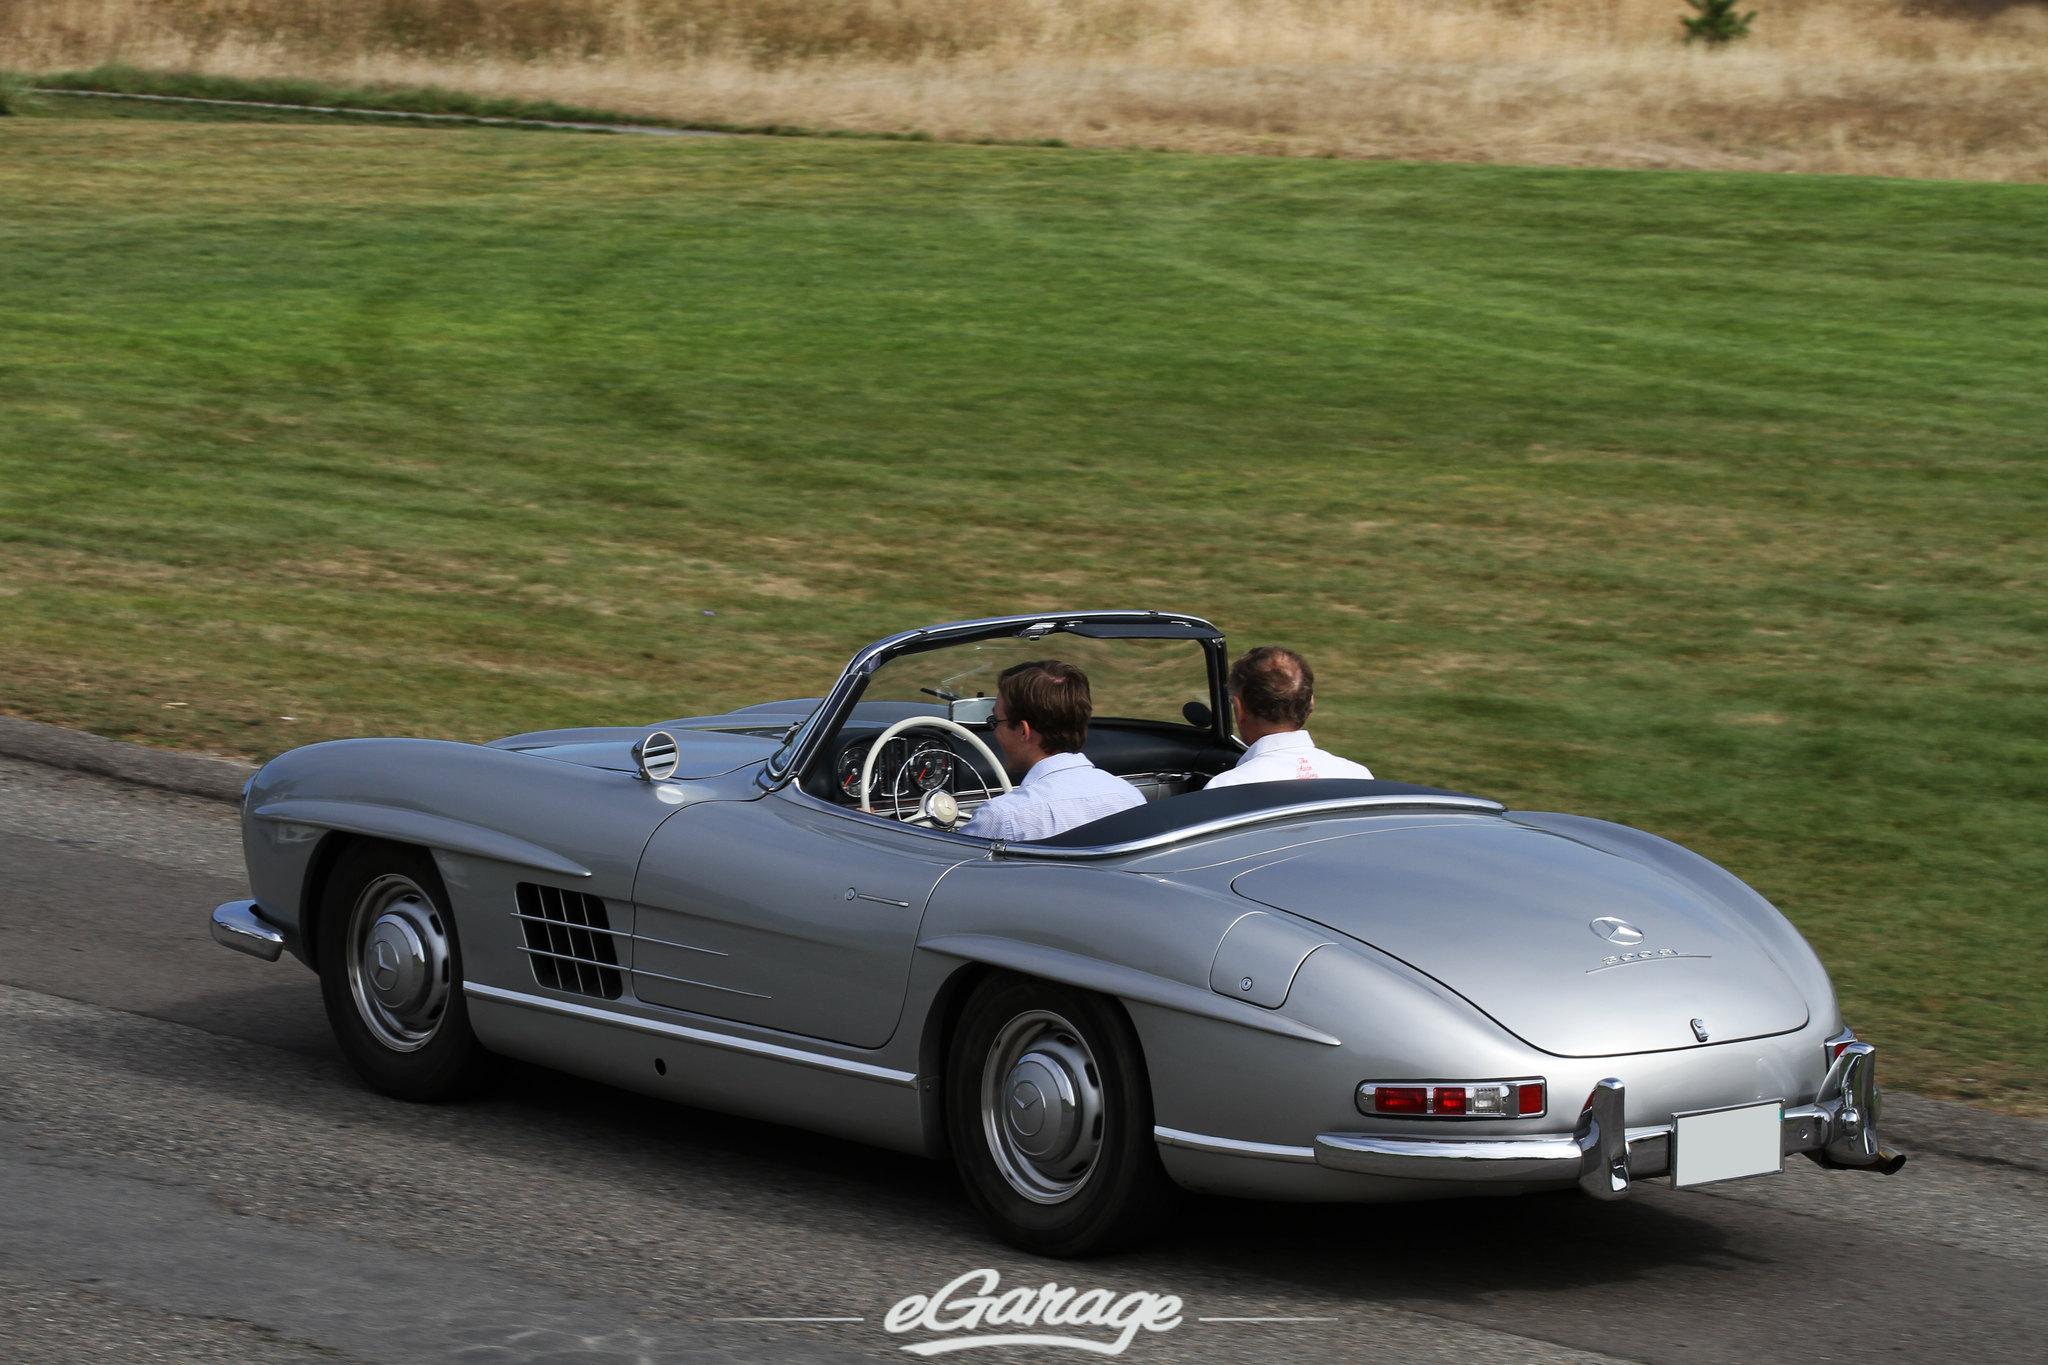 7828688526 8c3e40370a k Mercedes Benz Classic